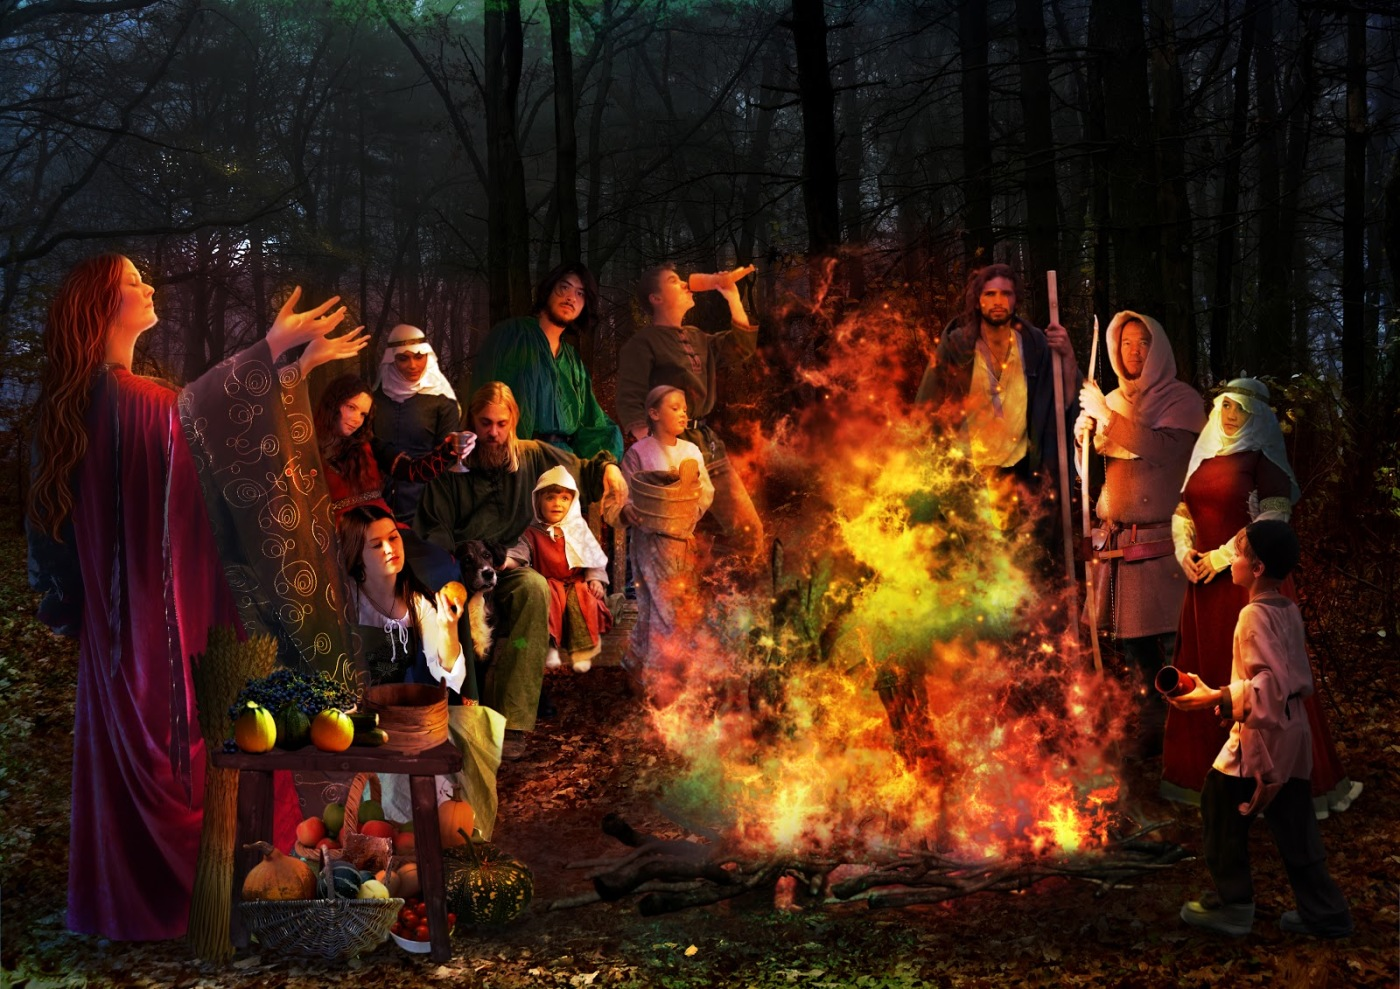 Feile Na Marbh  ( FAY-luh na MAR-ve ) – the Feast of the Dead | Image via The Wild Geese